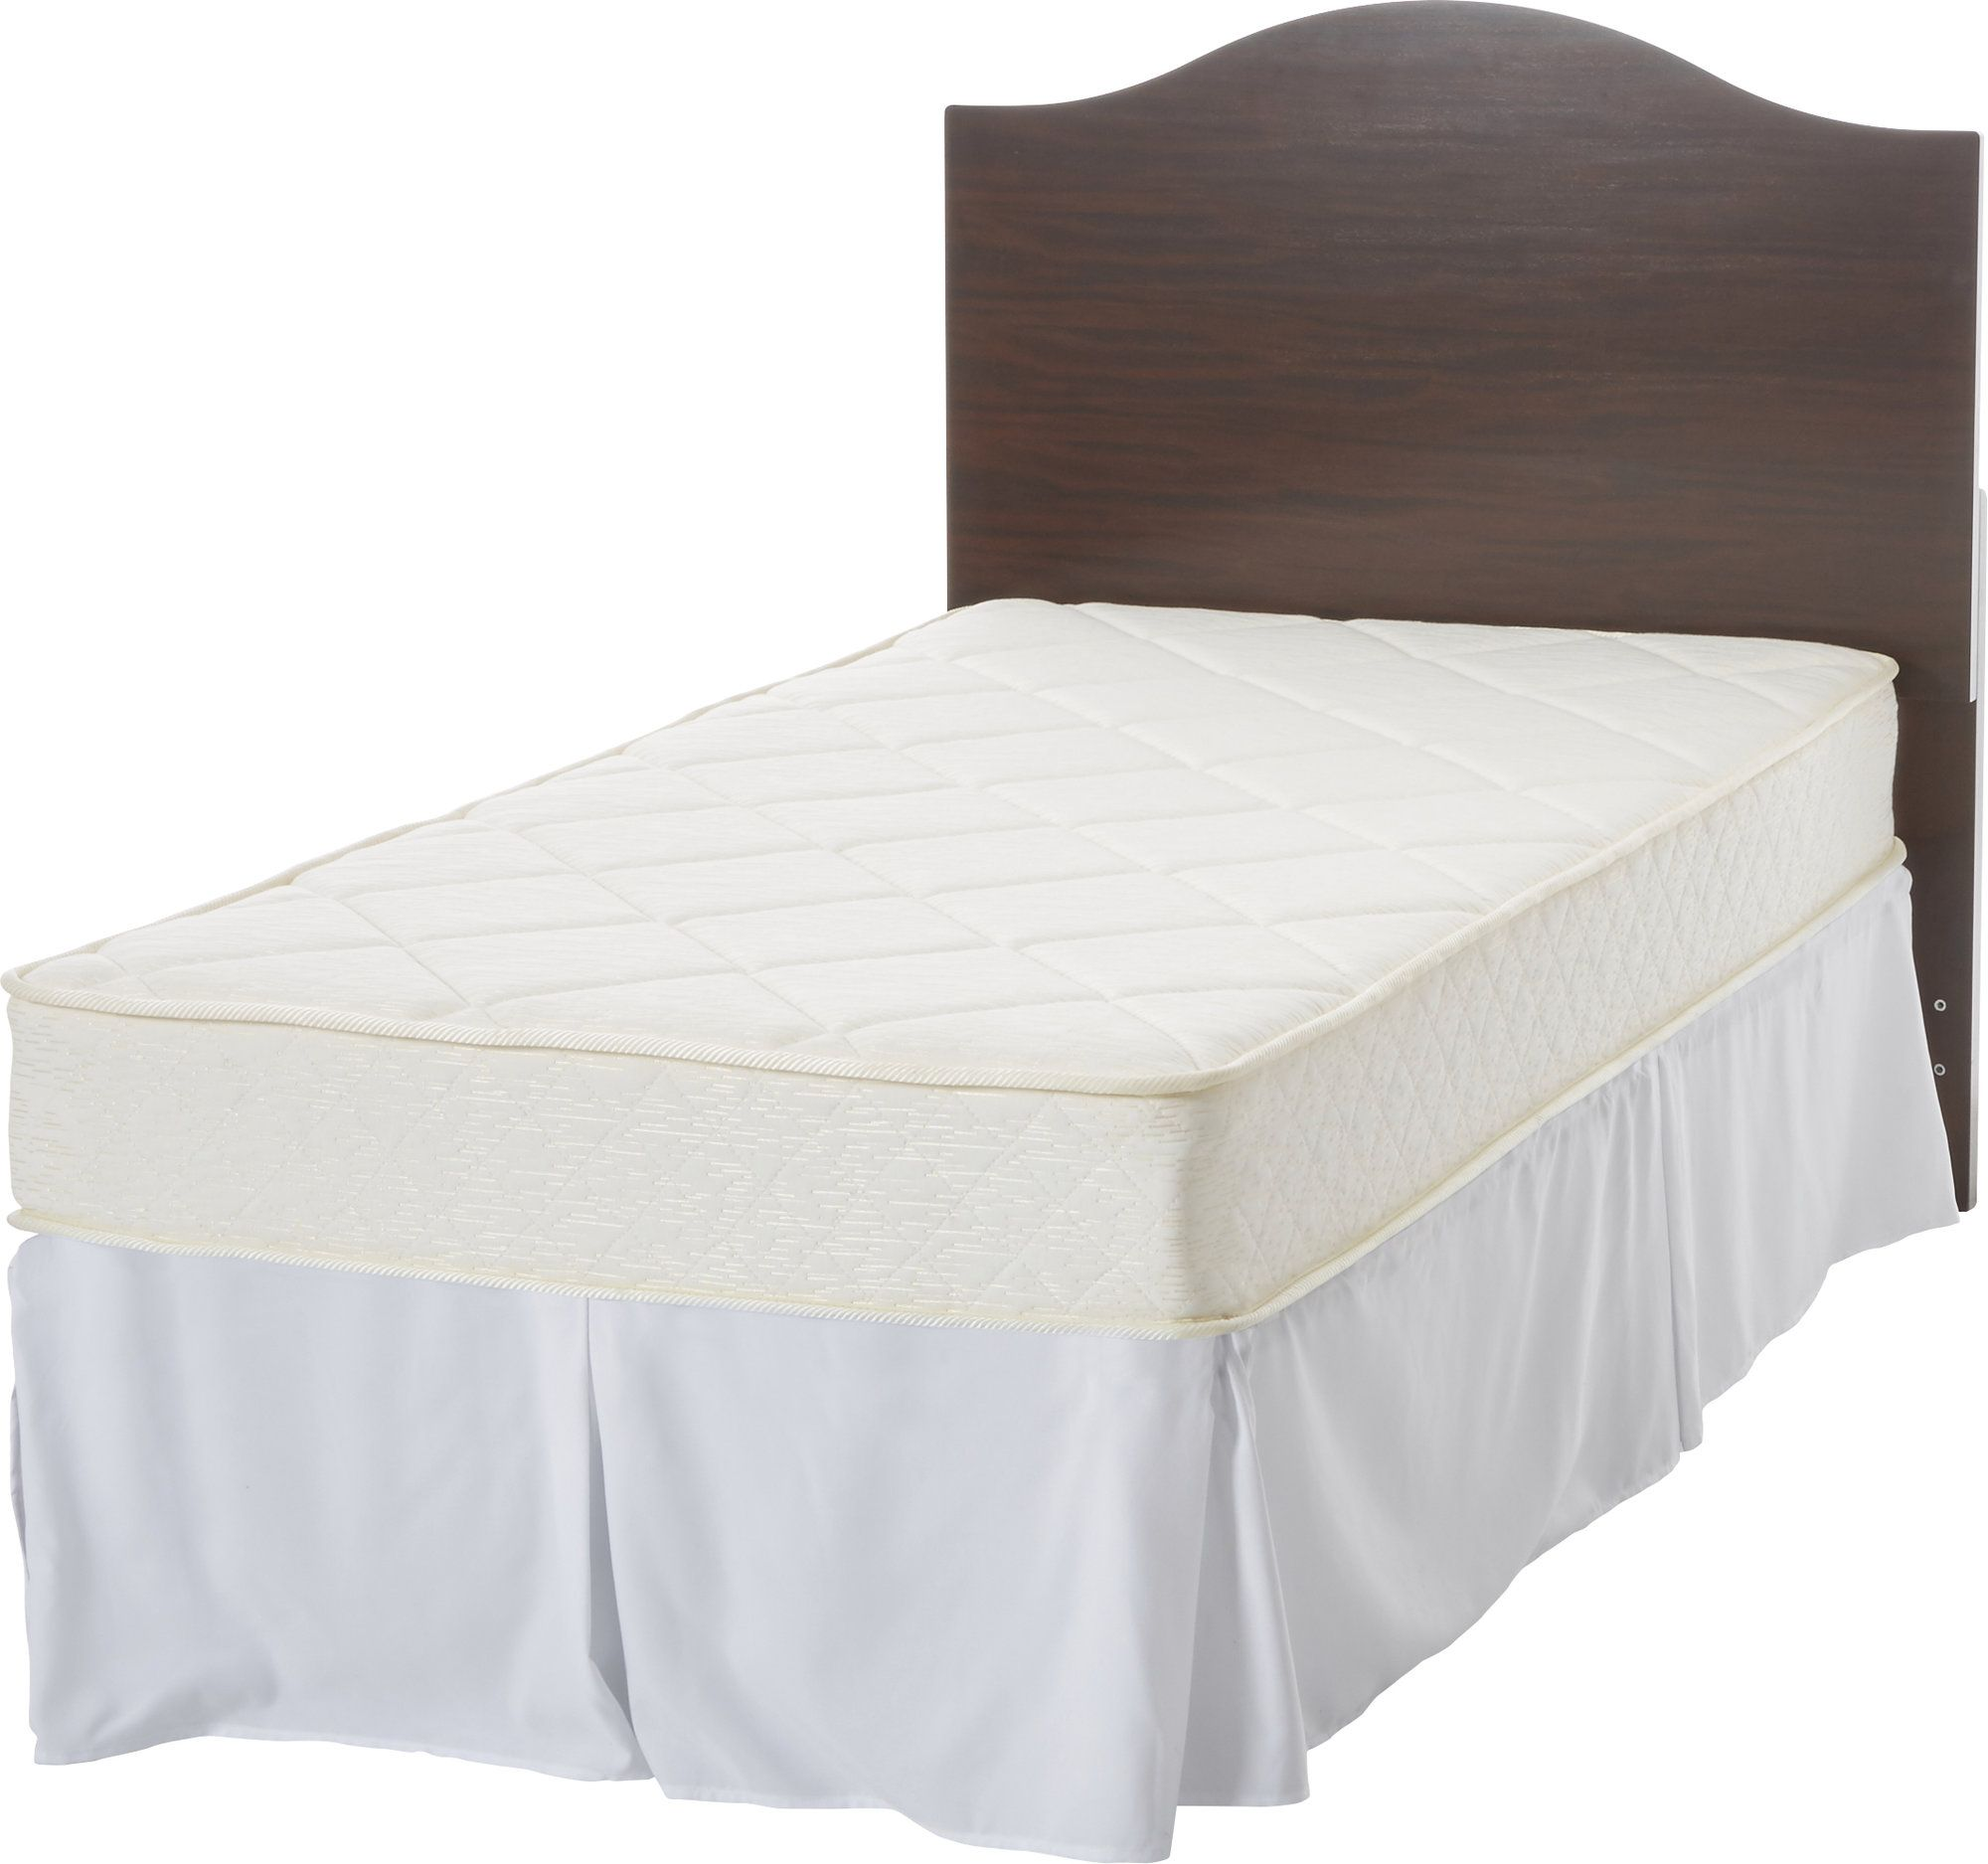 Wayfair Sleep Medium Innerspring Mattress Products